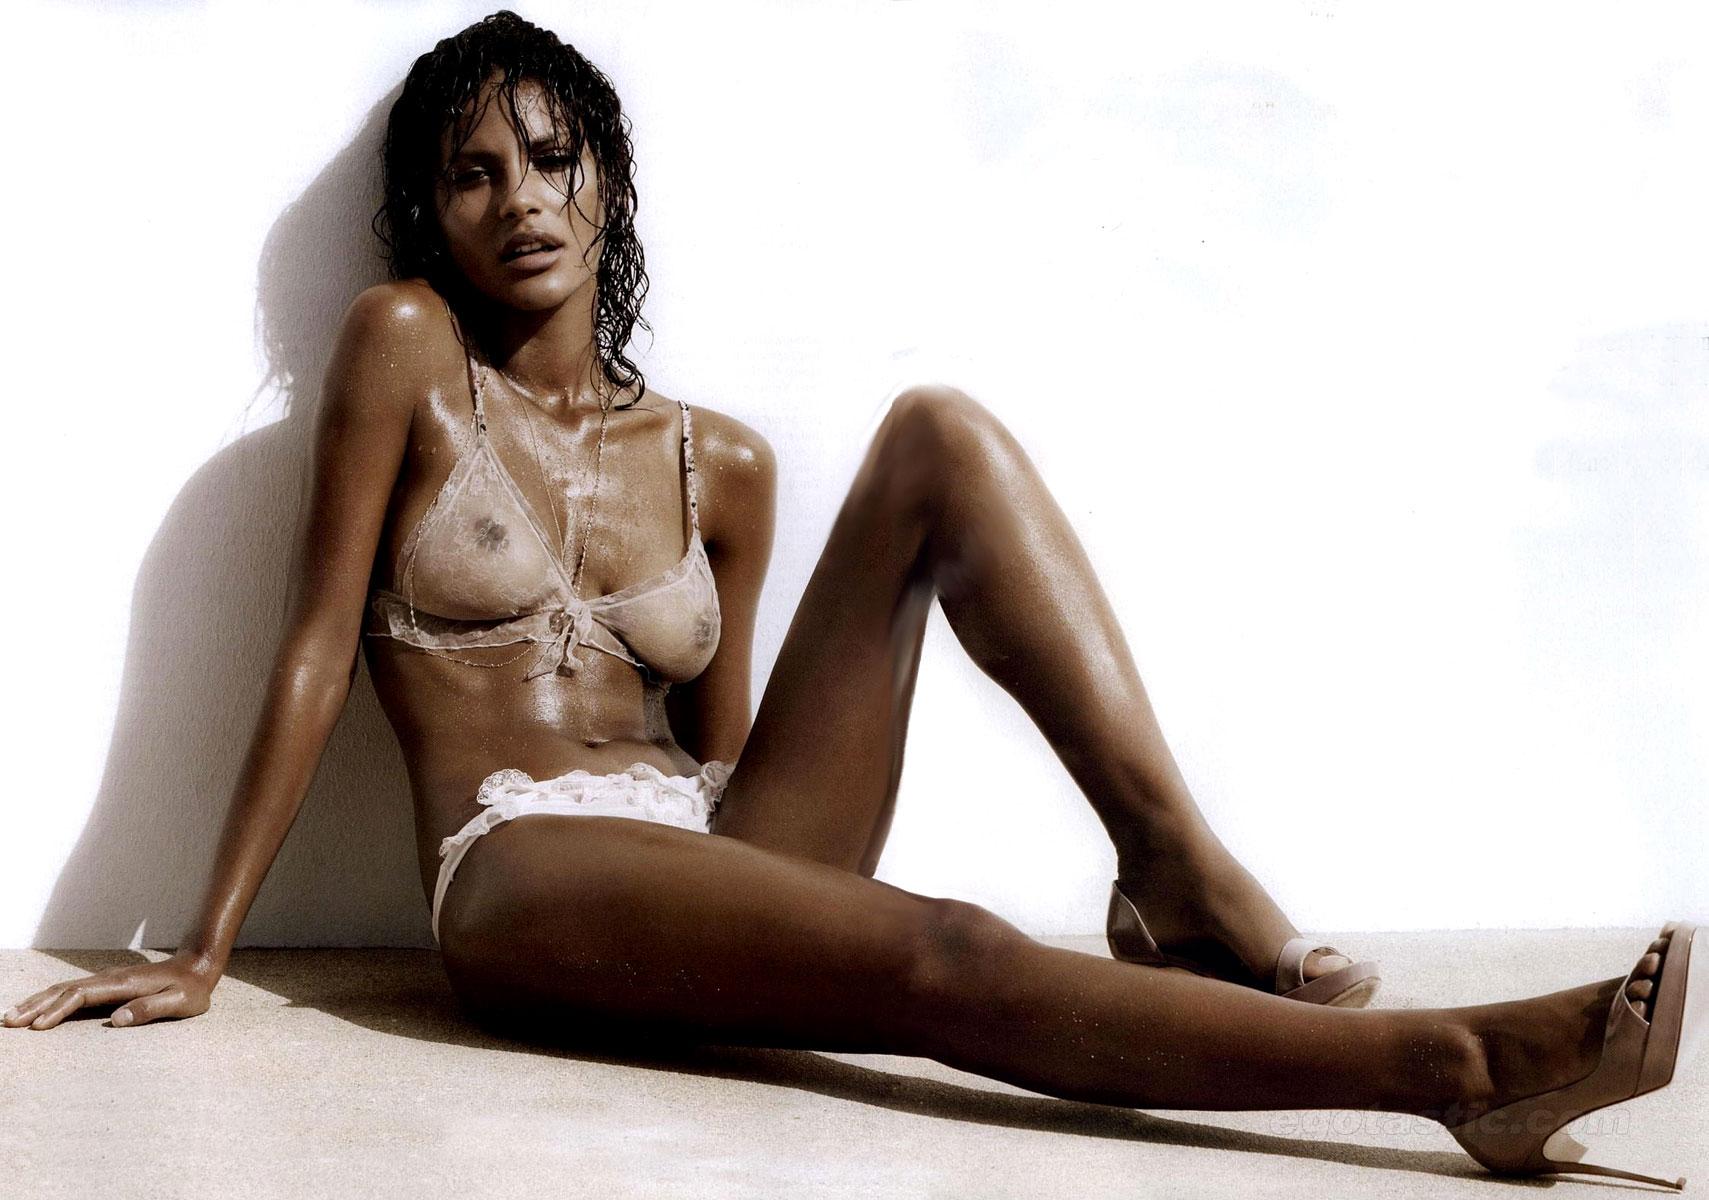 paula patton nude photoshoot